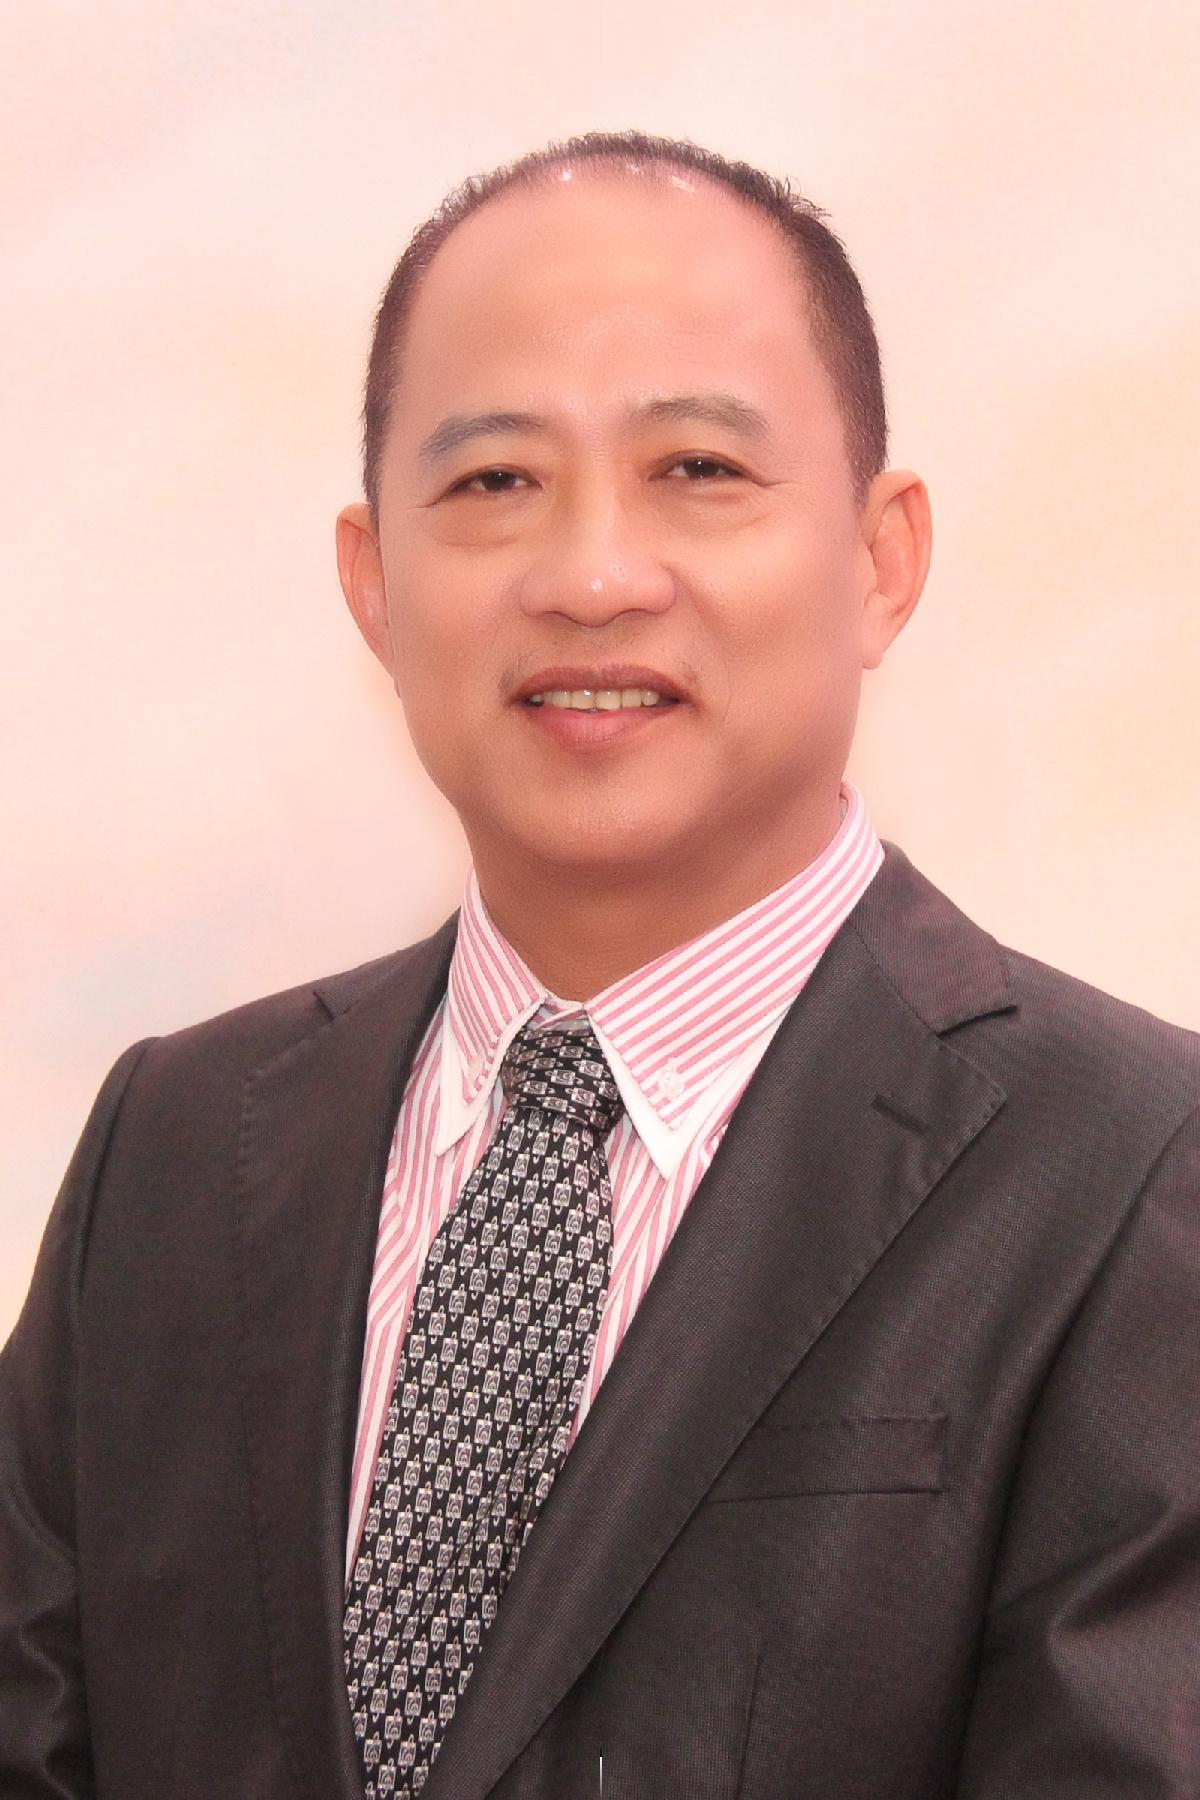 <h80>拿督刘钟隆</h80><br>Dato